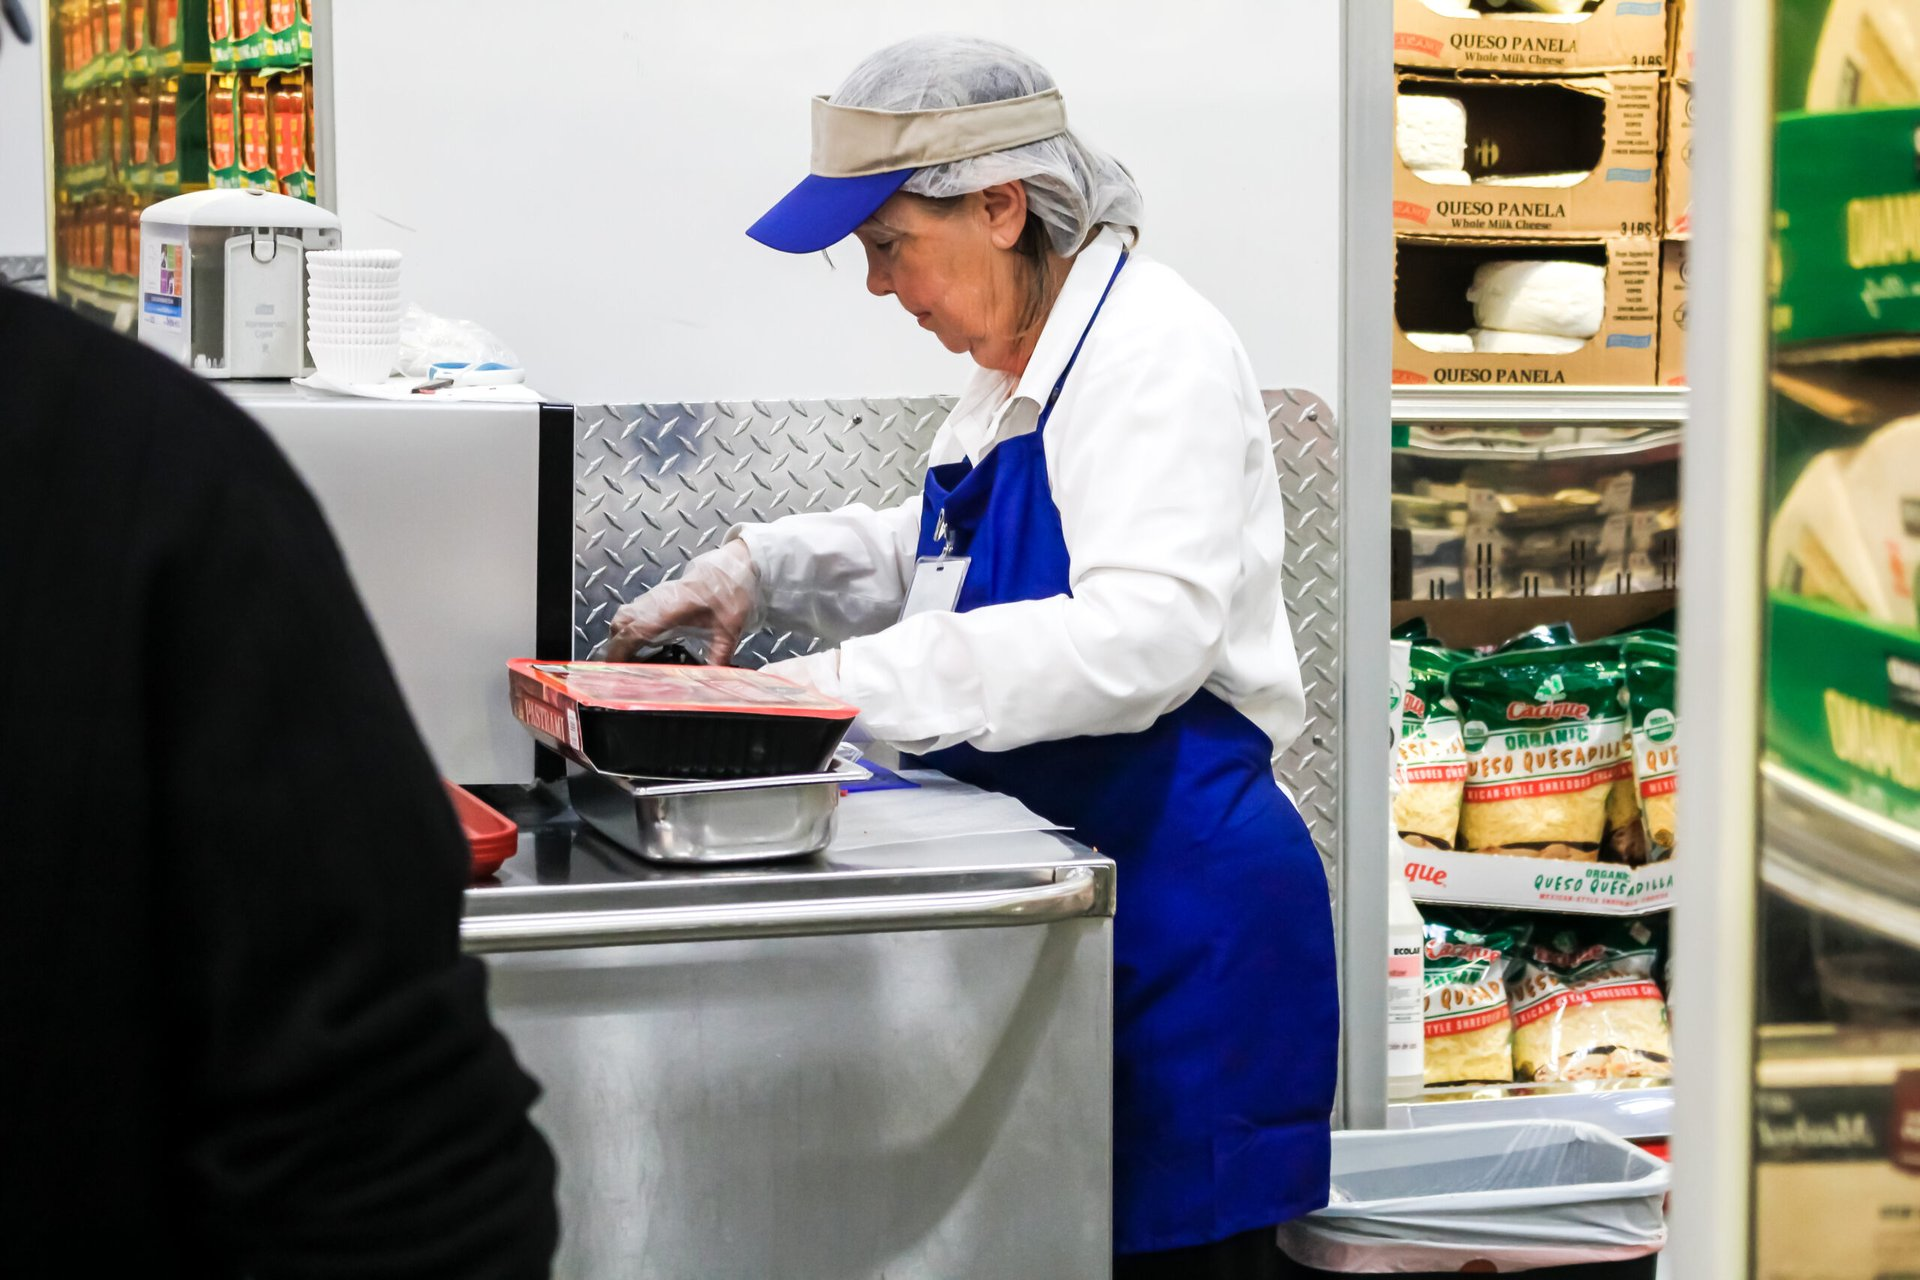 A woman providing food samples Costco